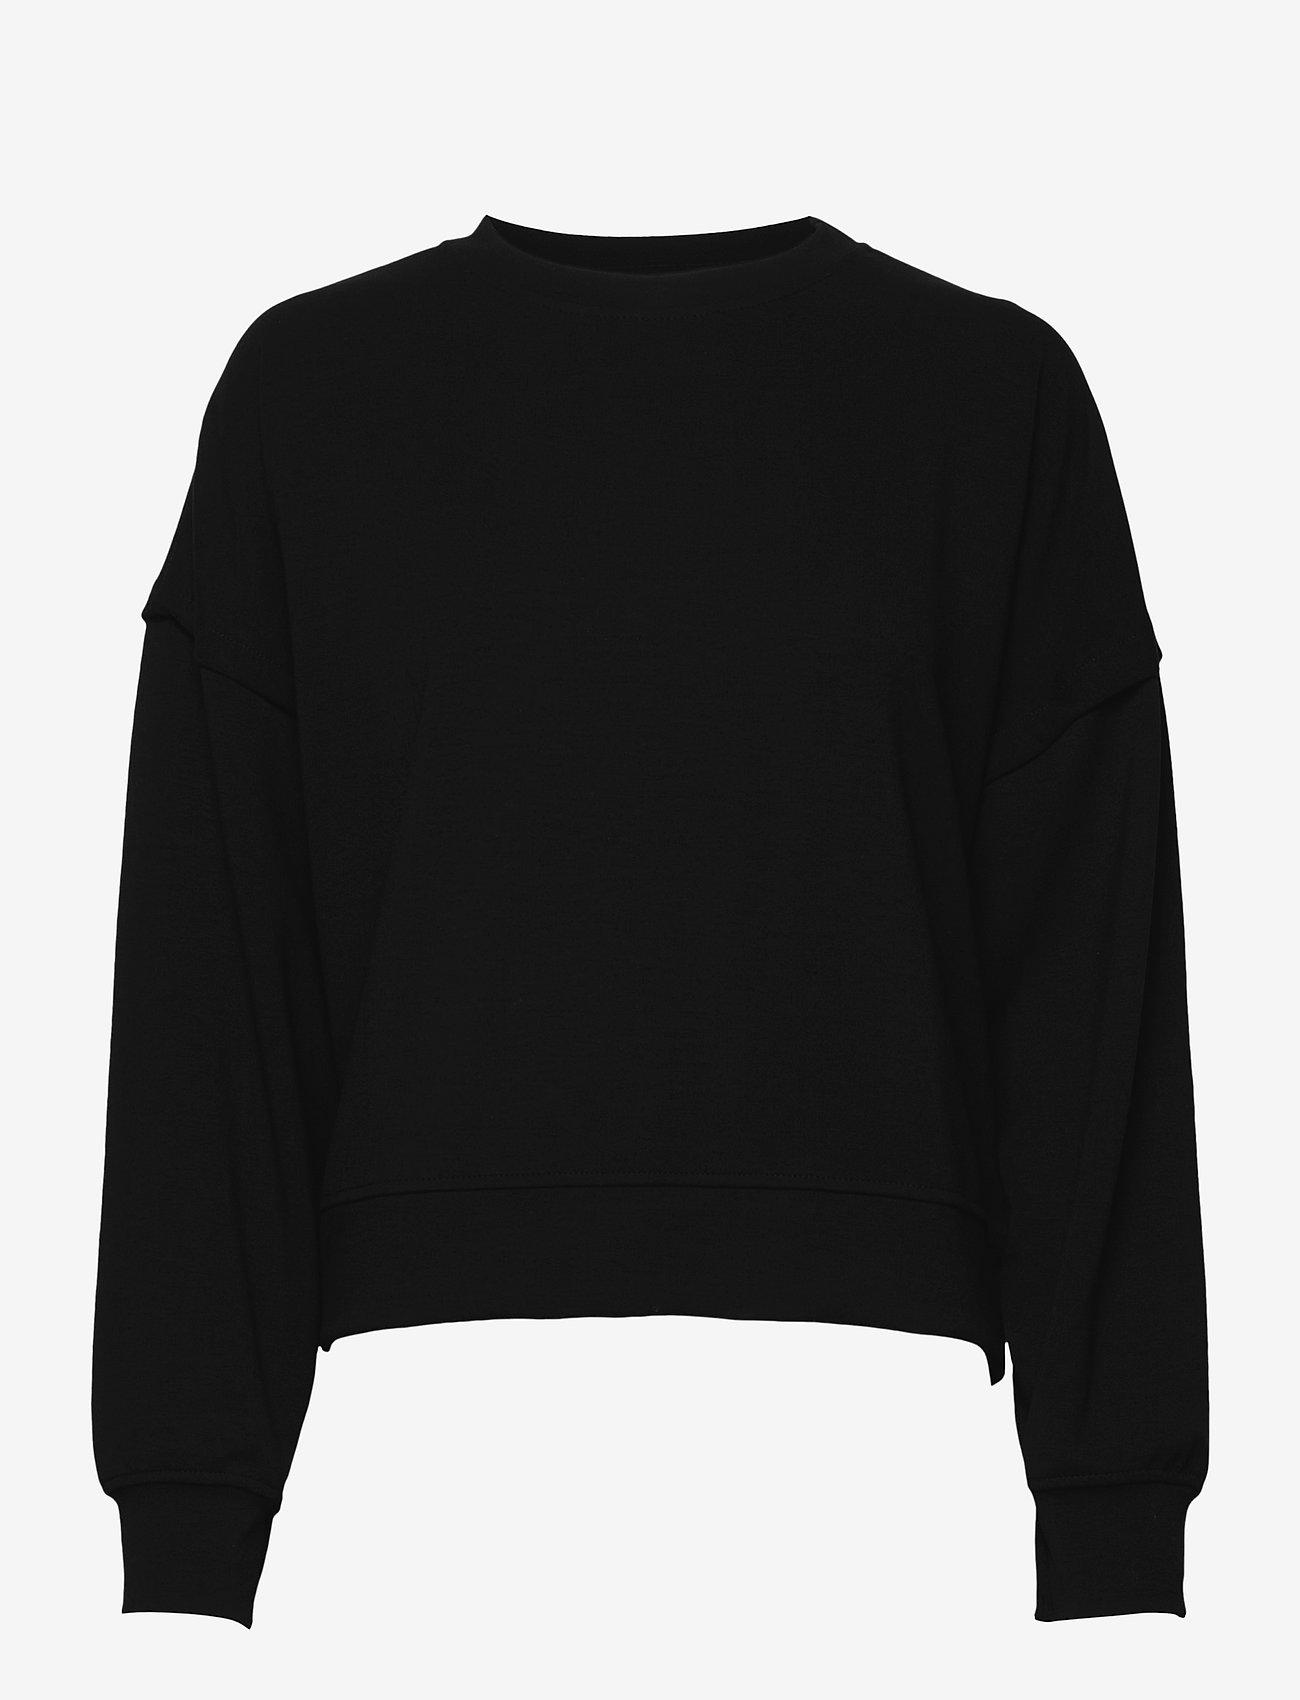 Gestuz - ChrisdaGZ sweatshirt - sweatshirts - black - 0